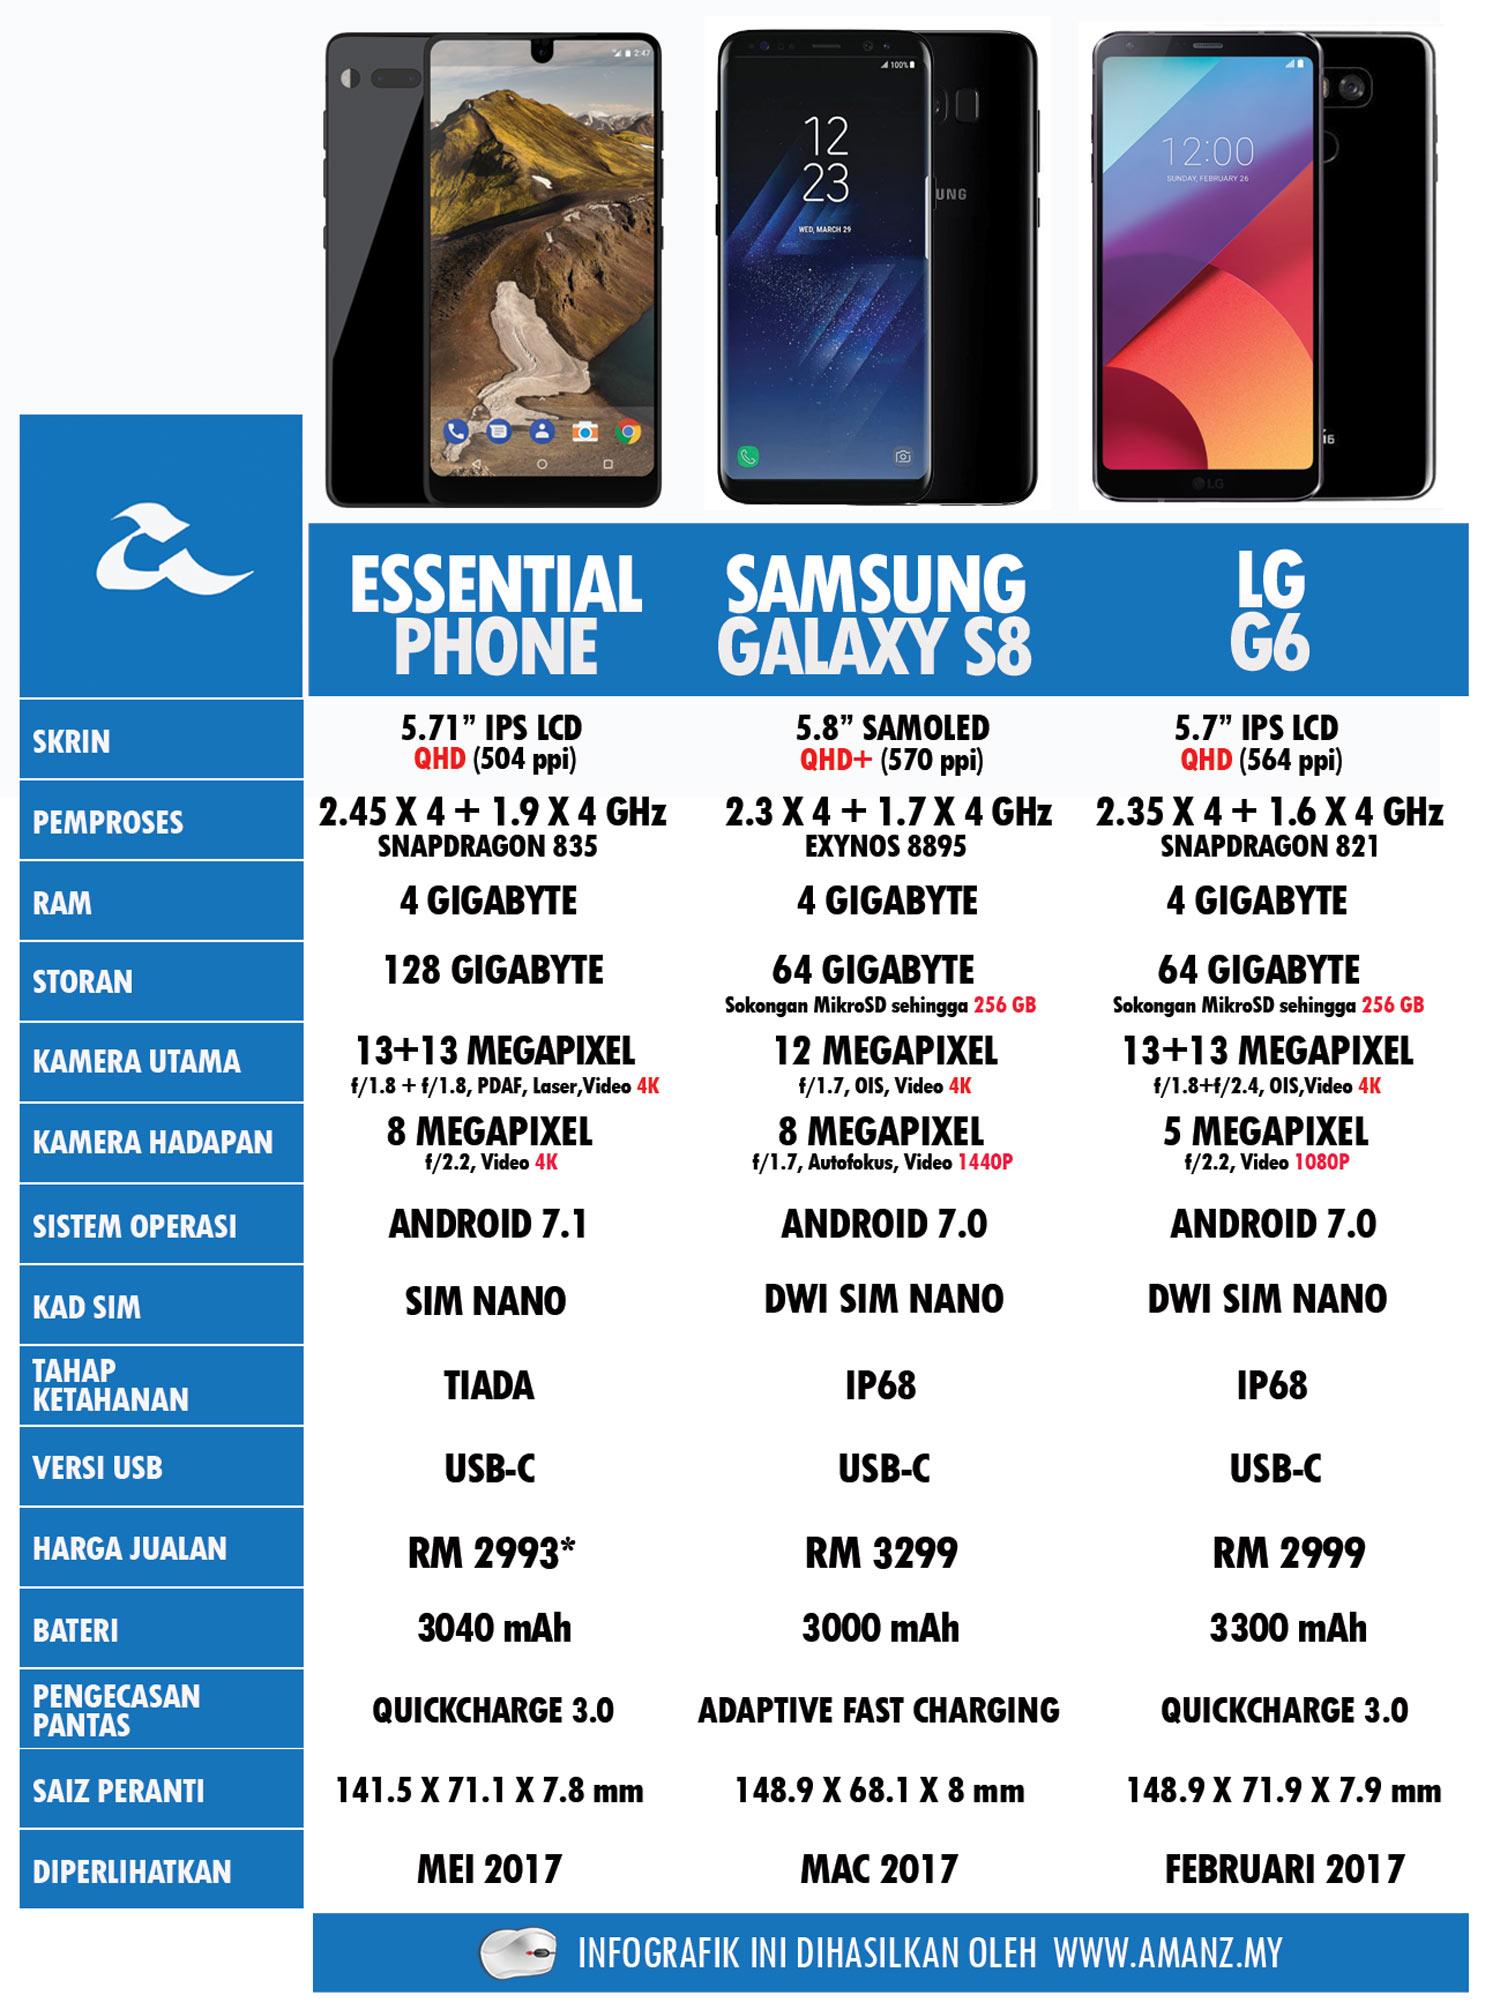 Perbandingan Essential Phone, Samsung Galaxy S8 Dan LG G6